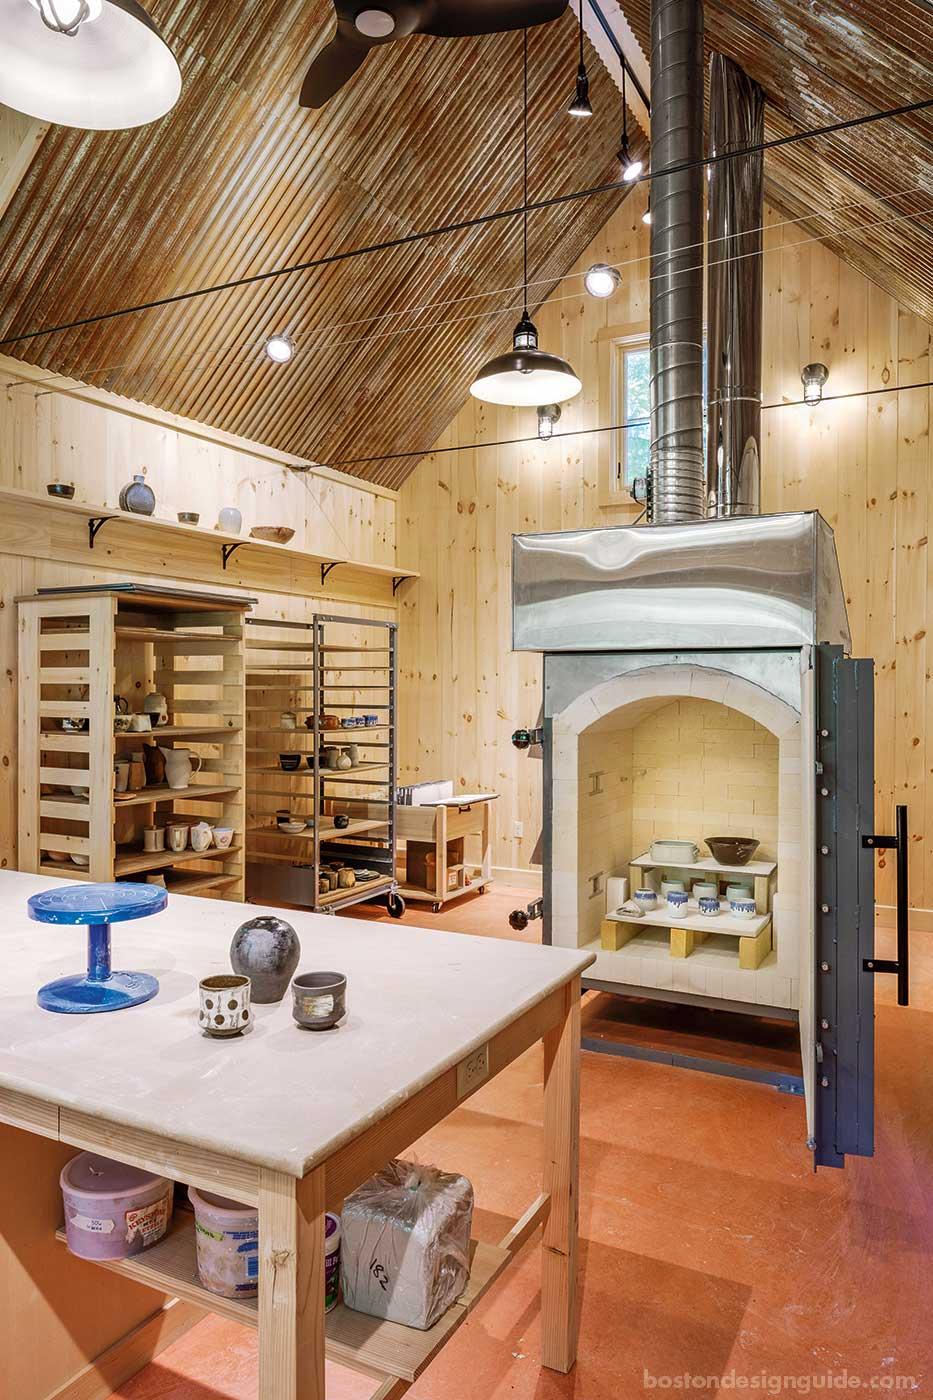 Ceramic studio by architect John D. Battle